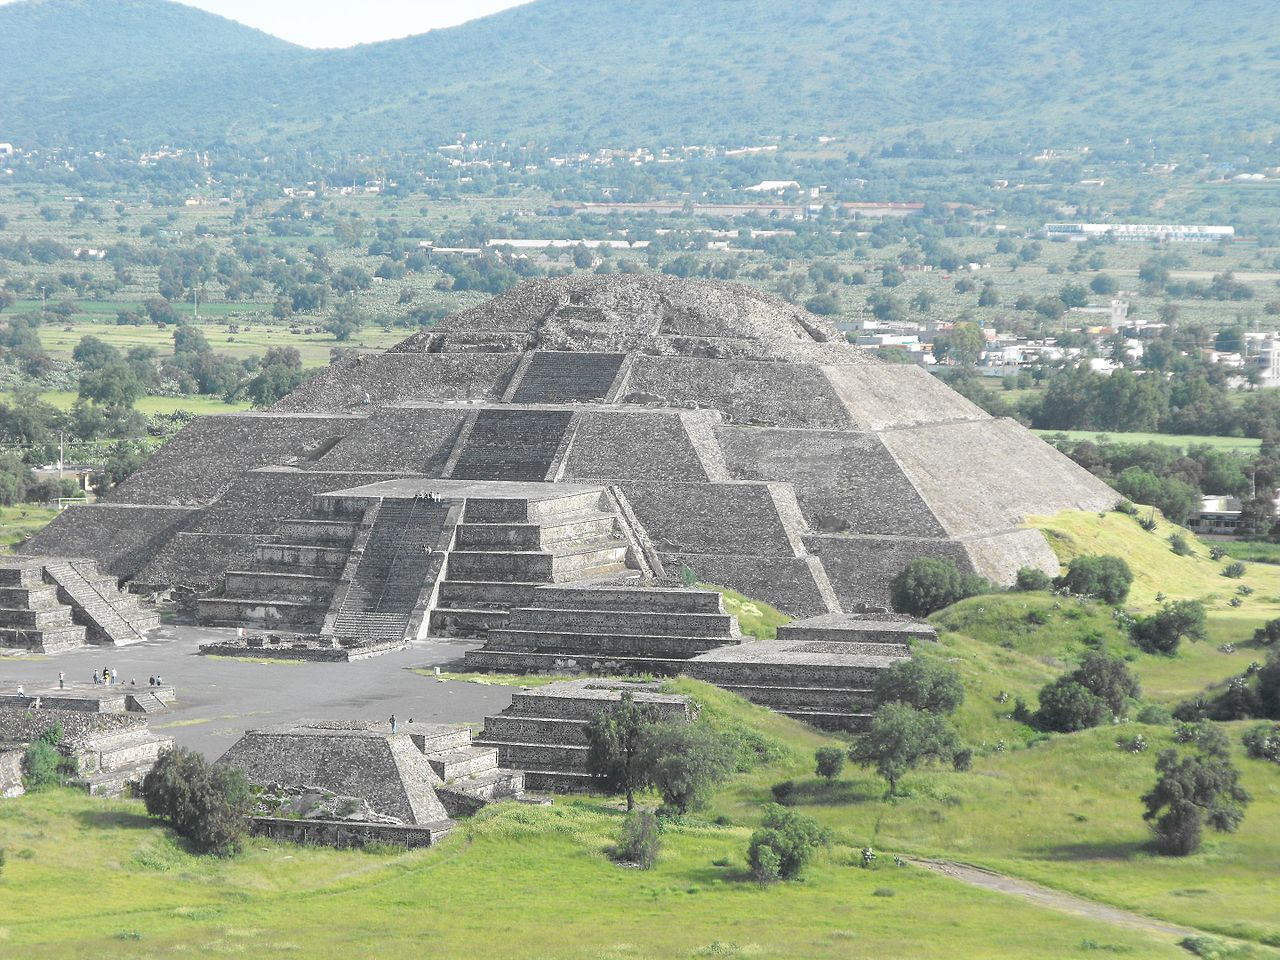 Pyramid_of_the_Moon_-_Teotihuacan_-_Mexico_-_panoramio.jpg